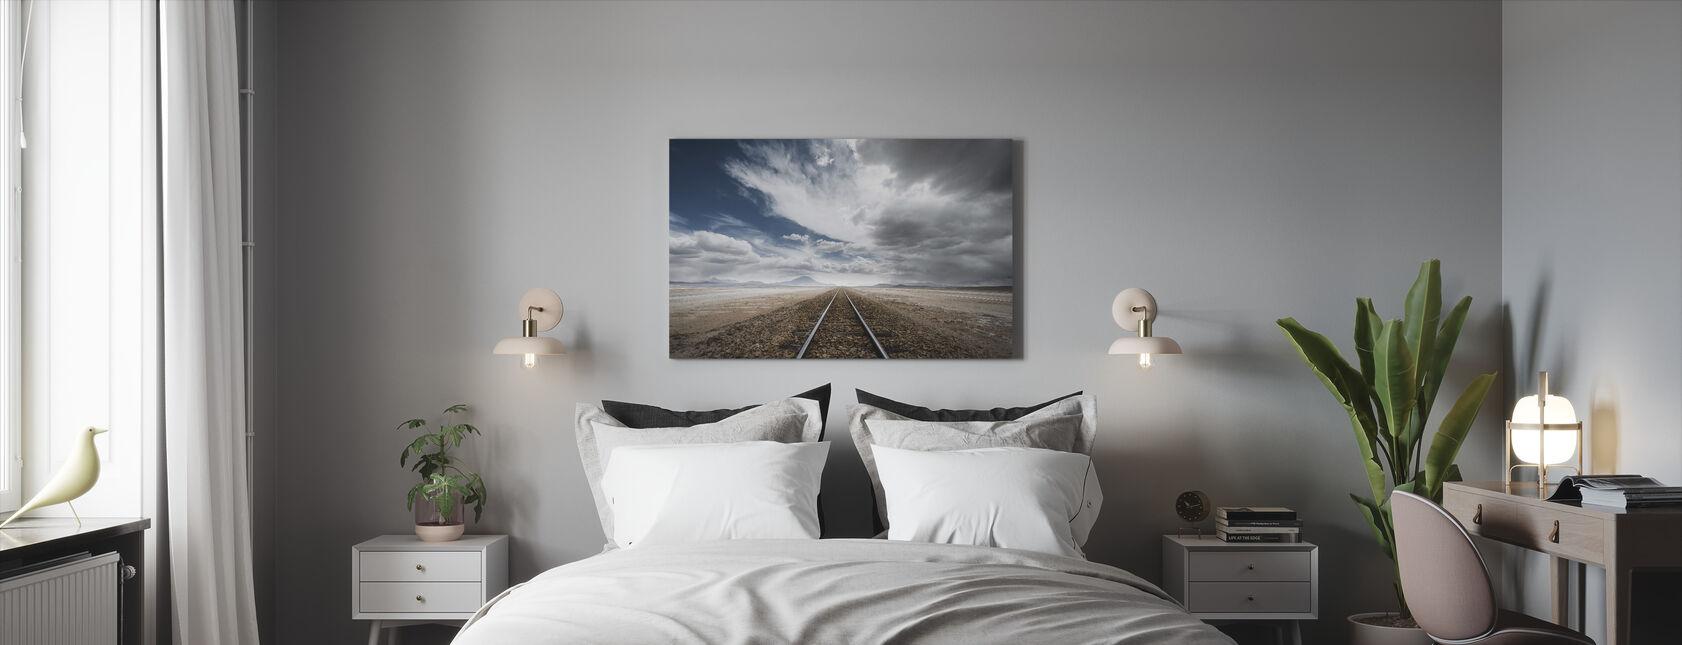 Camino largo - Lienzo - Dormitorio